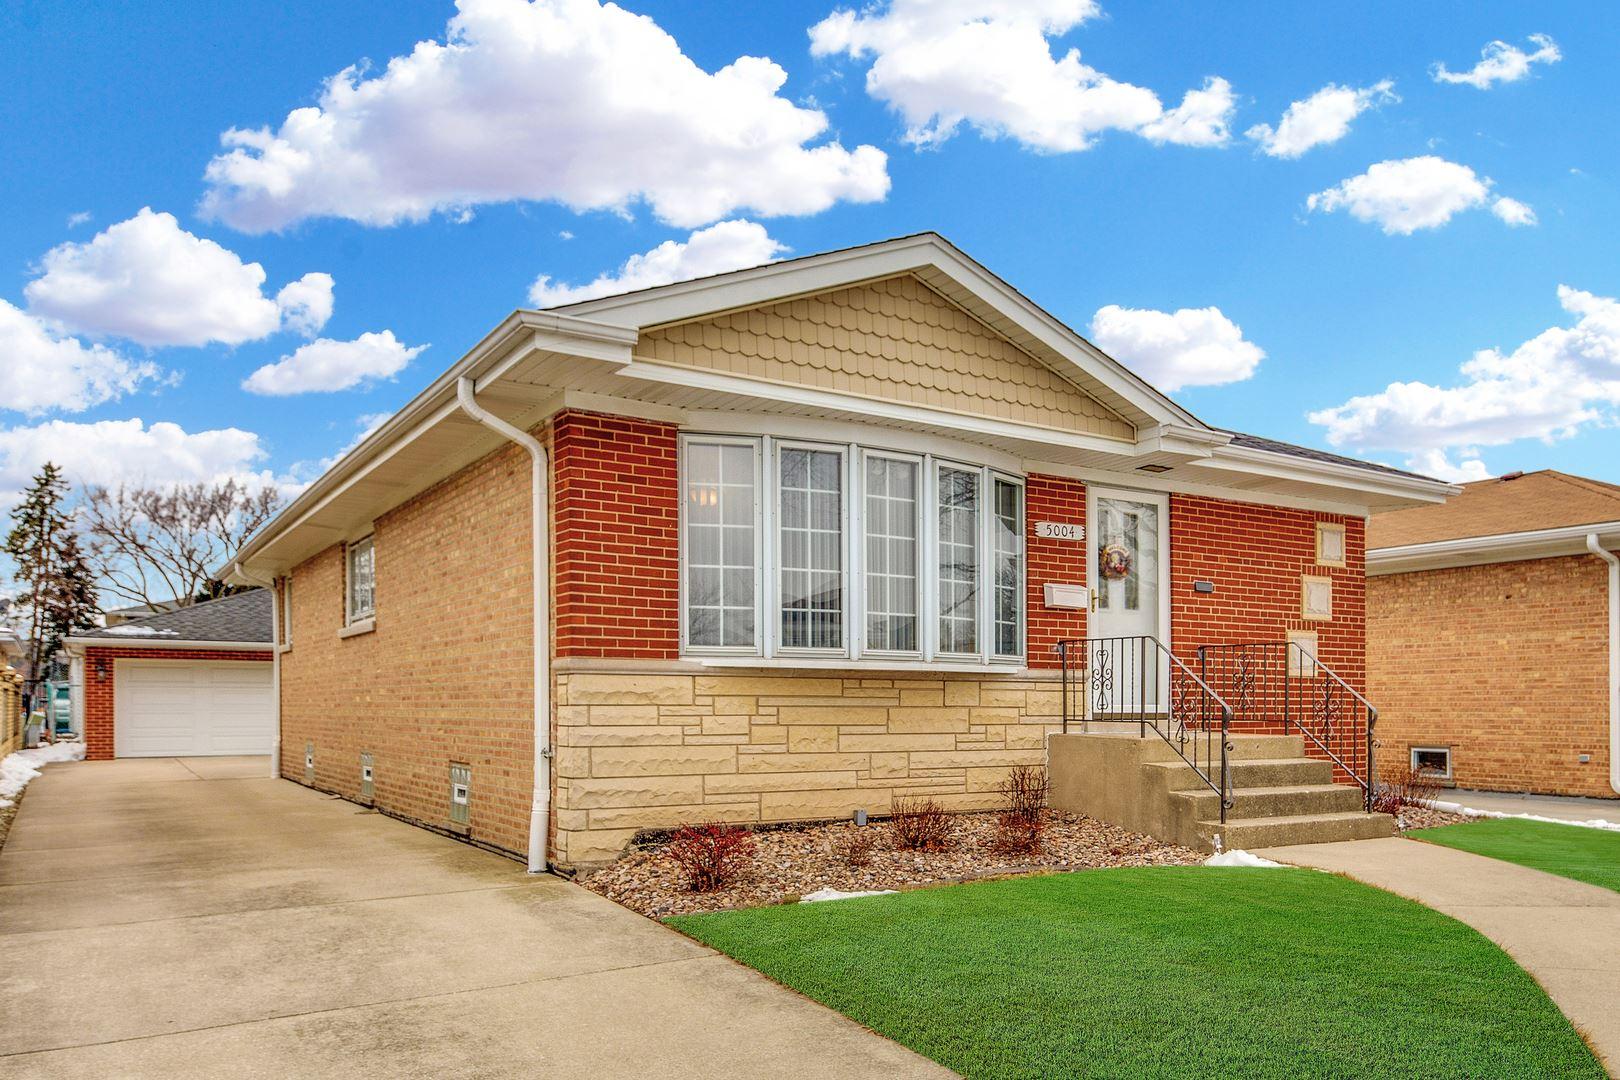 5004 N Knight Avenue, Norridge, IL 60706 - #: 10966220